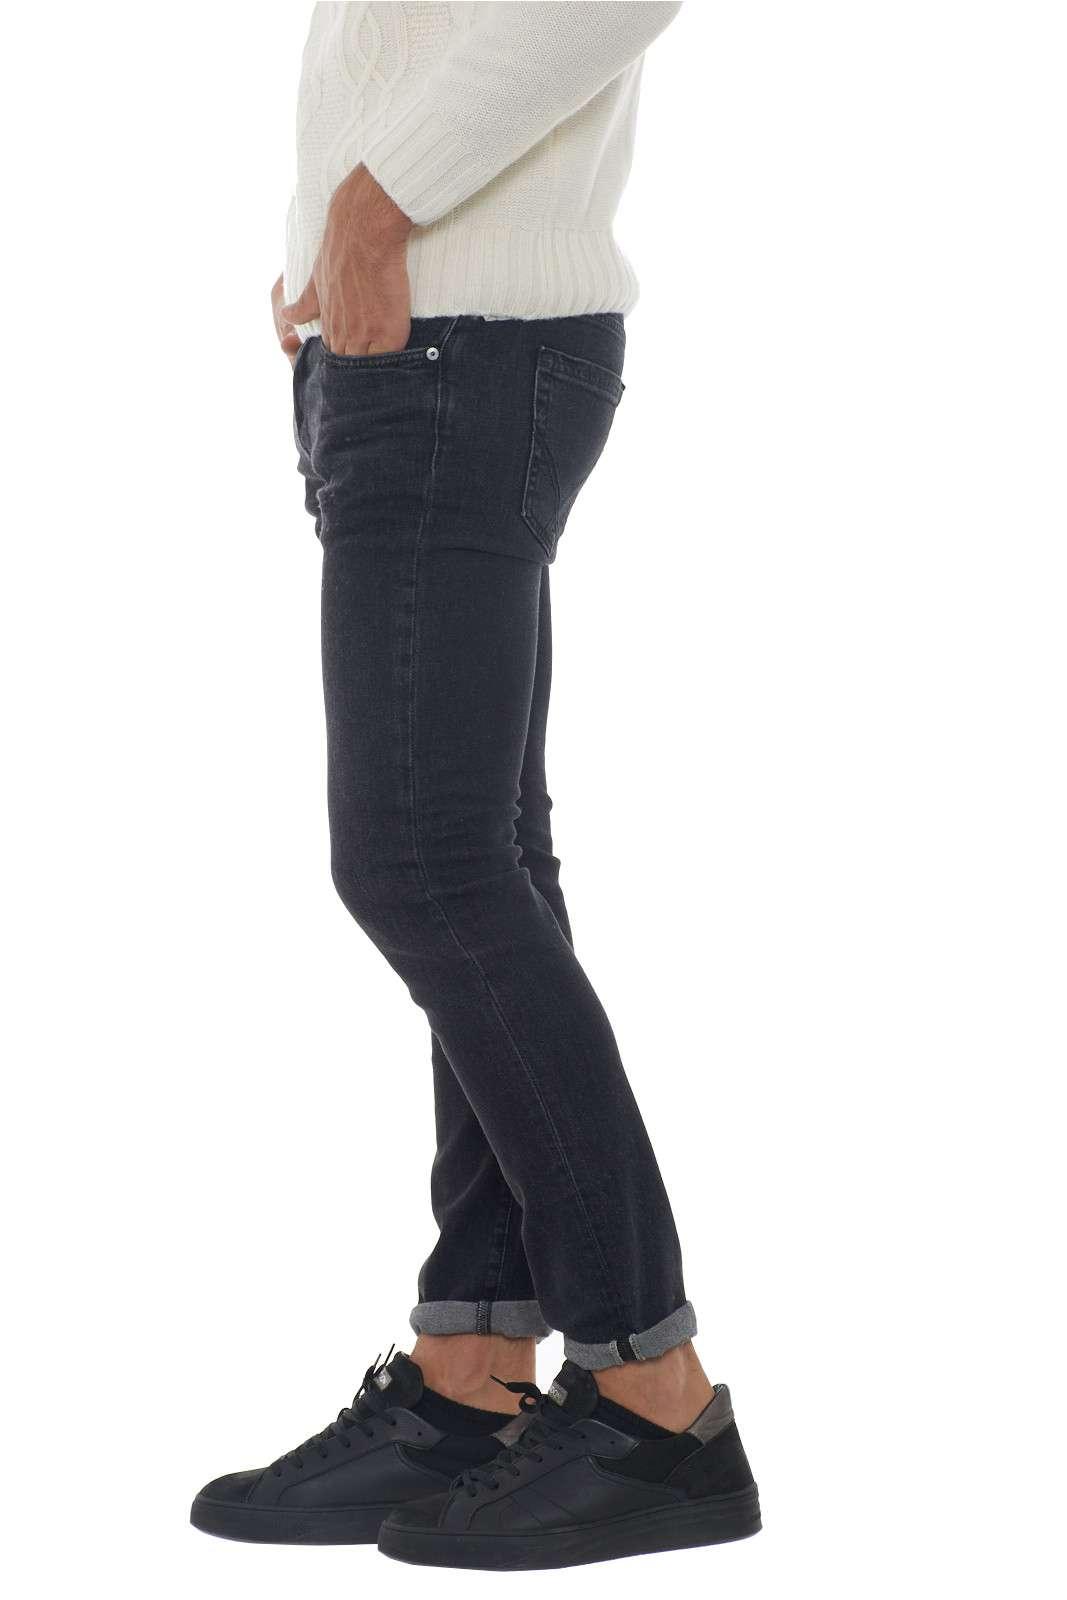 https://www.parmax.com/media/catalog/product/a/i/AI-Outlet_Parmax-Pantalone-Uomo-RoyRogers-A19RRU076N0311319-B.jpg